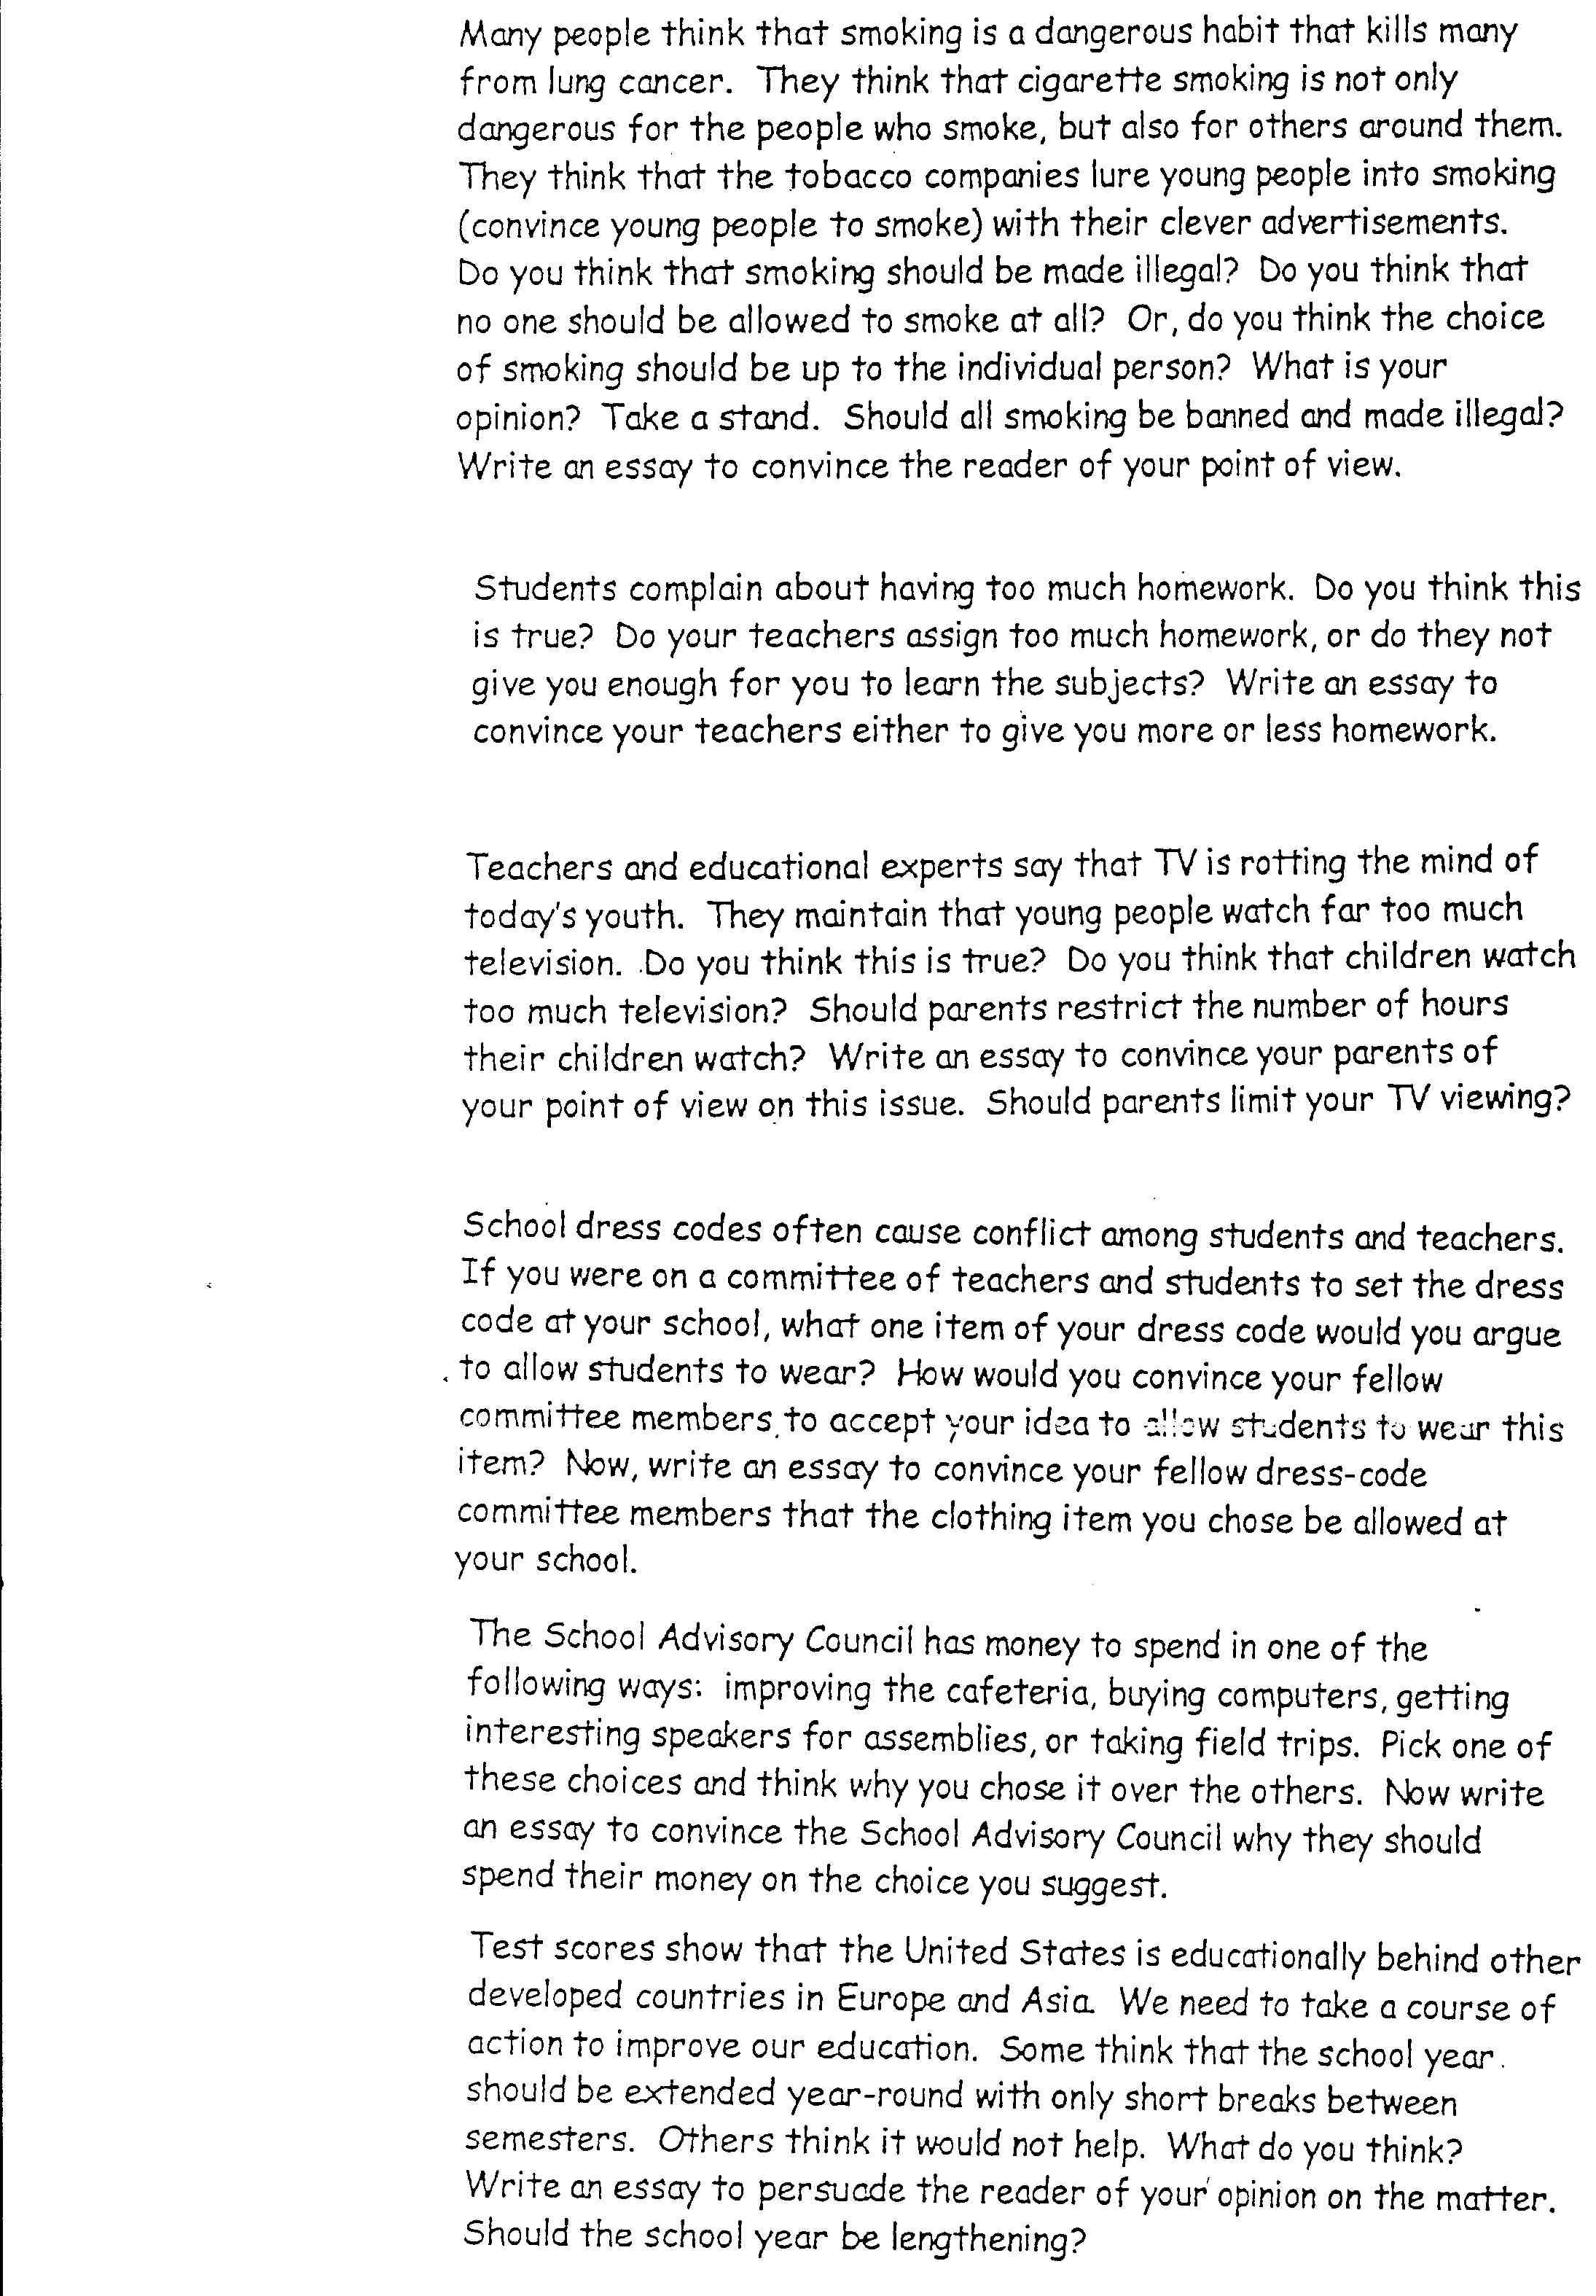 020 Interesting Essay Topics Argumentative Persuasive L Amazing For Grade 7 9 Pat 7th Full